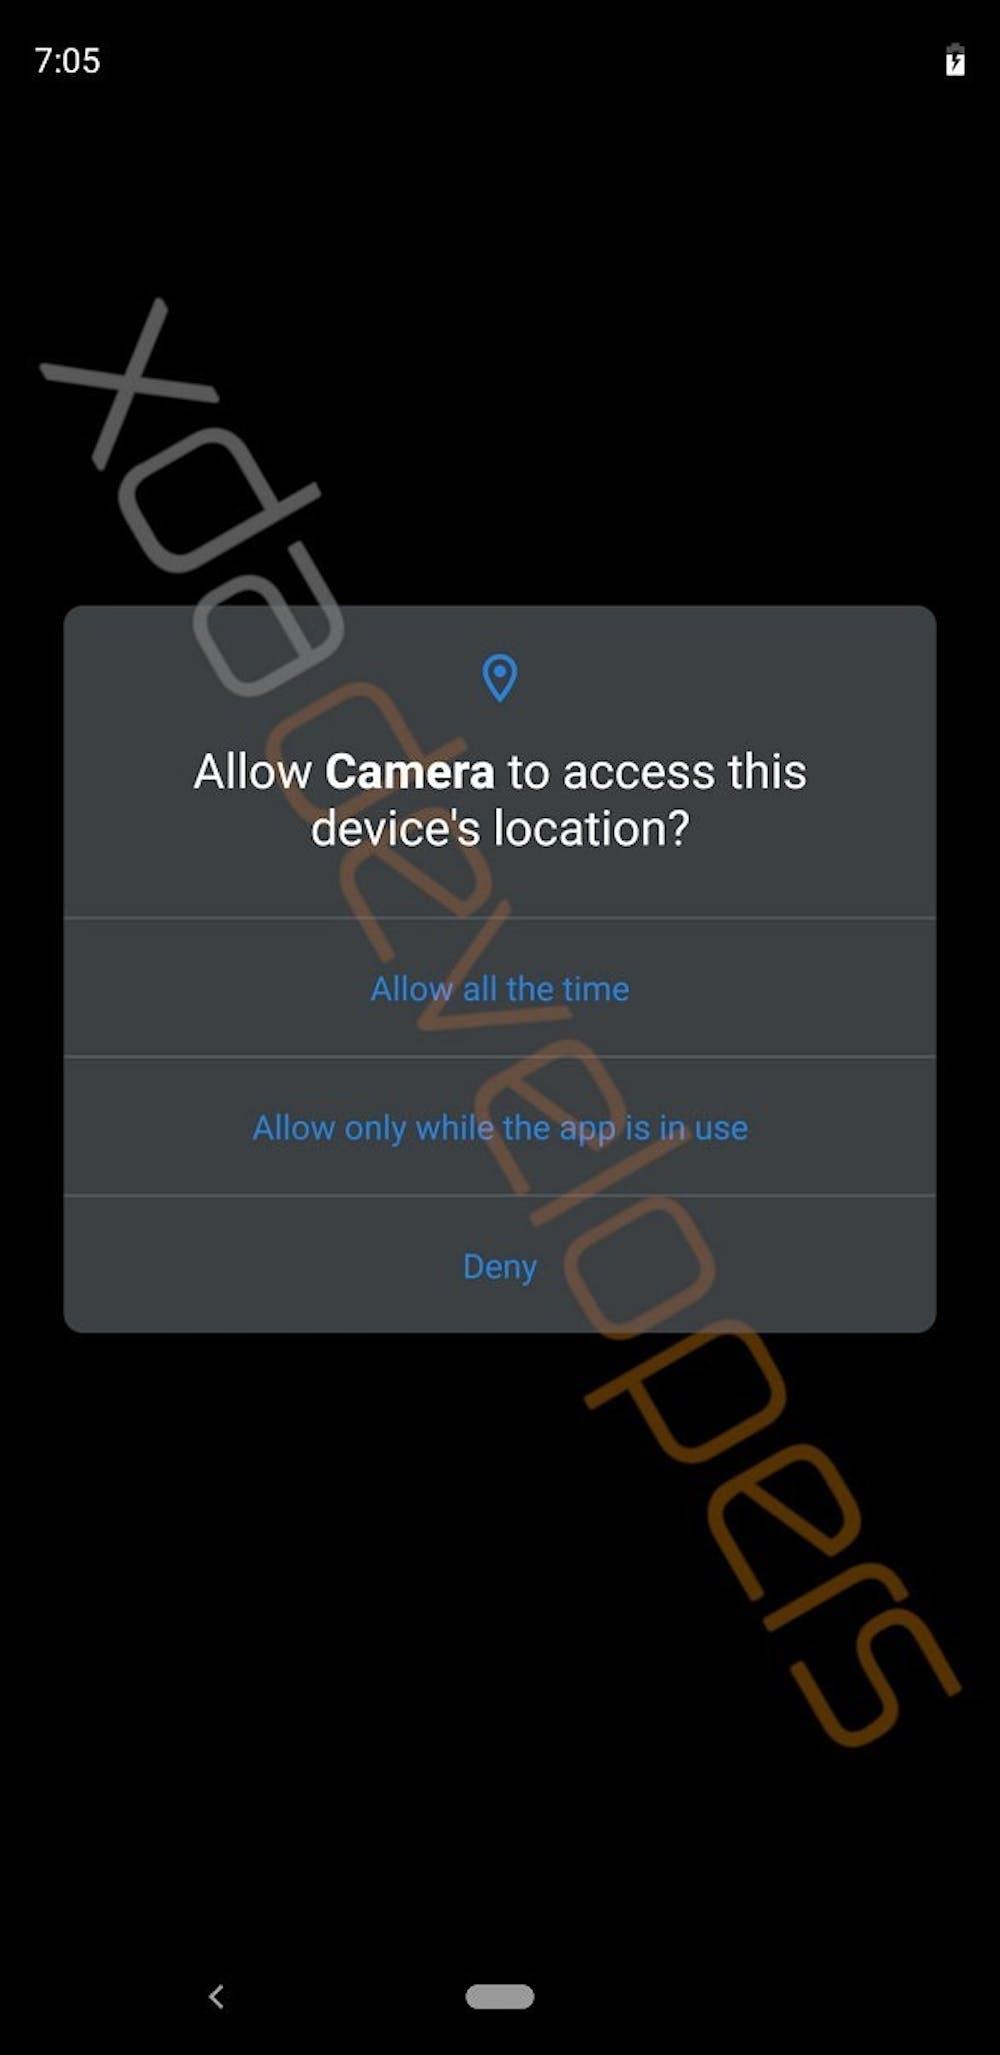 Android Q mit überarbeiteten App-Berechtigungen. (Bild: XDA Developers)